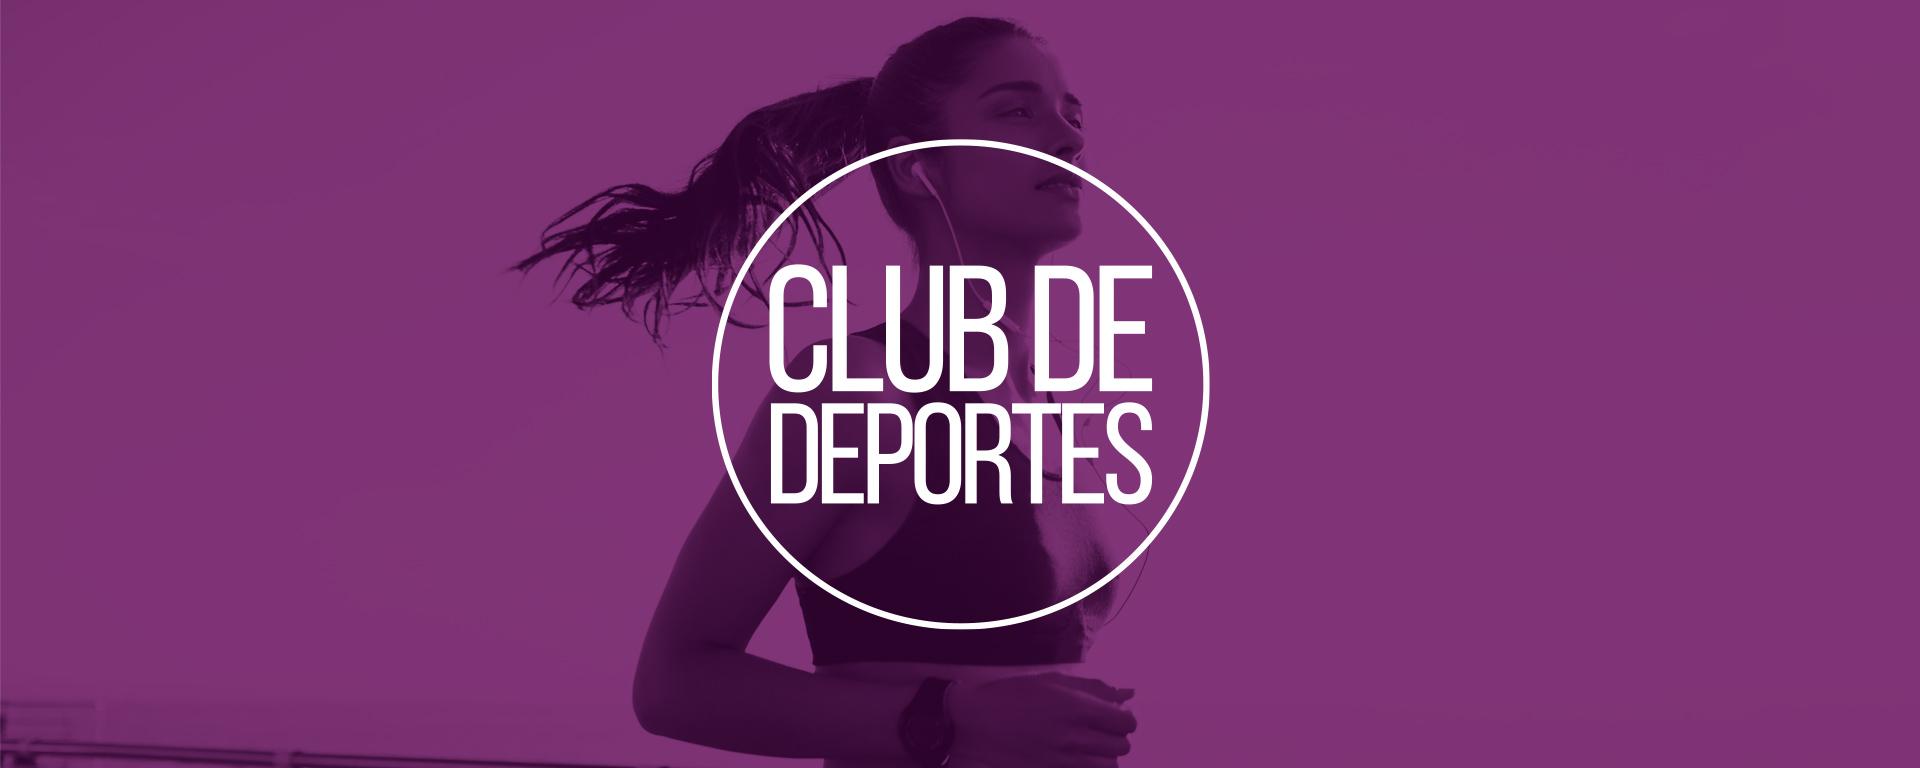 1920x768 club